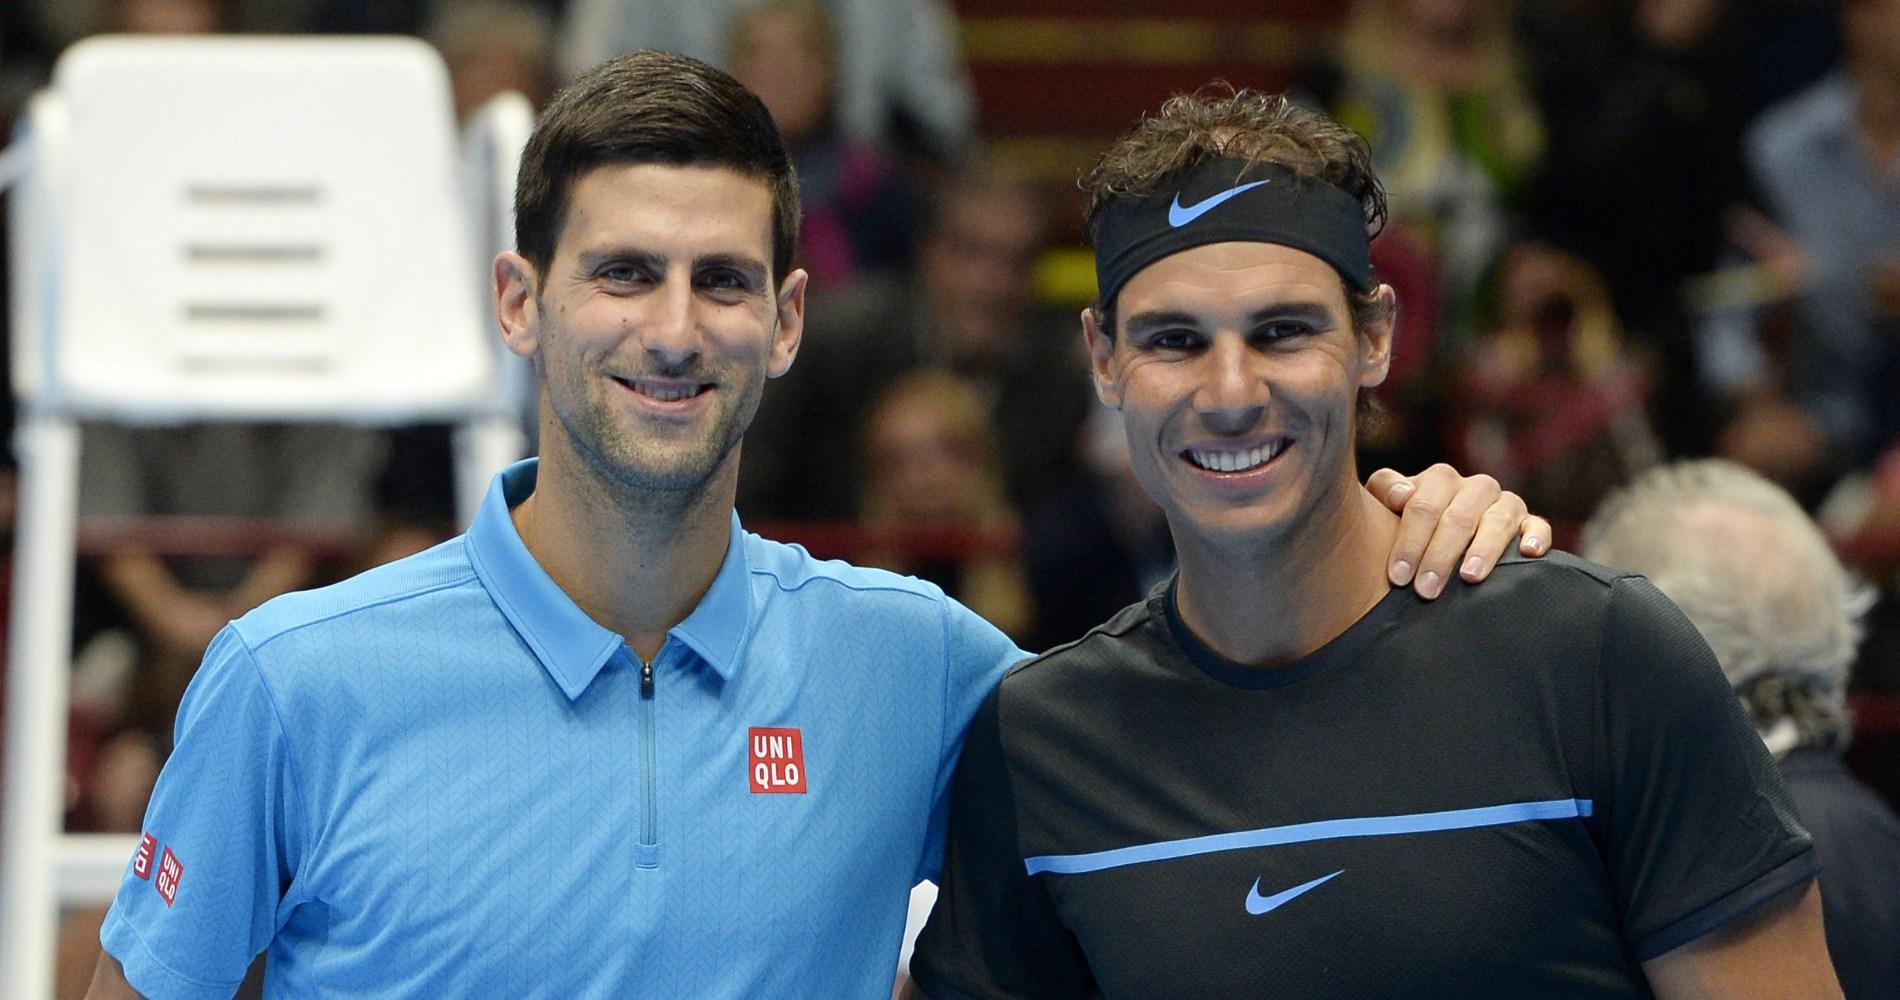 Rafael Nadal et Novak Djokovic lors d'une exhibition à Milan en 2016